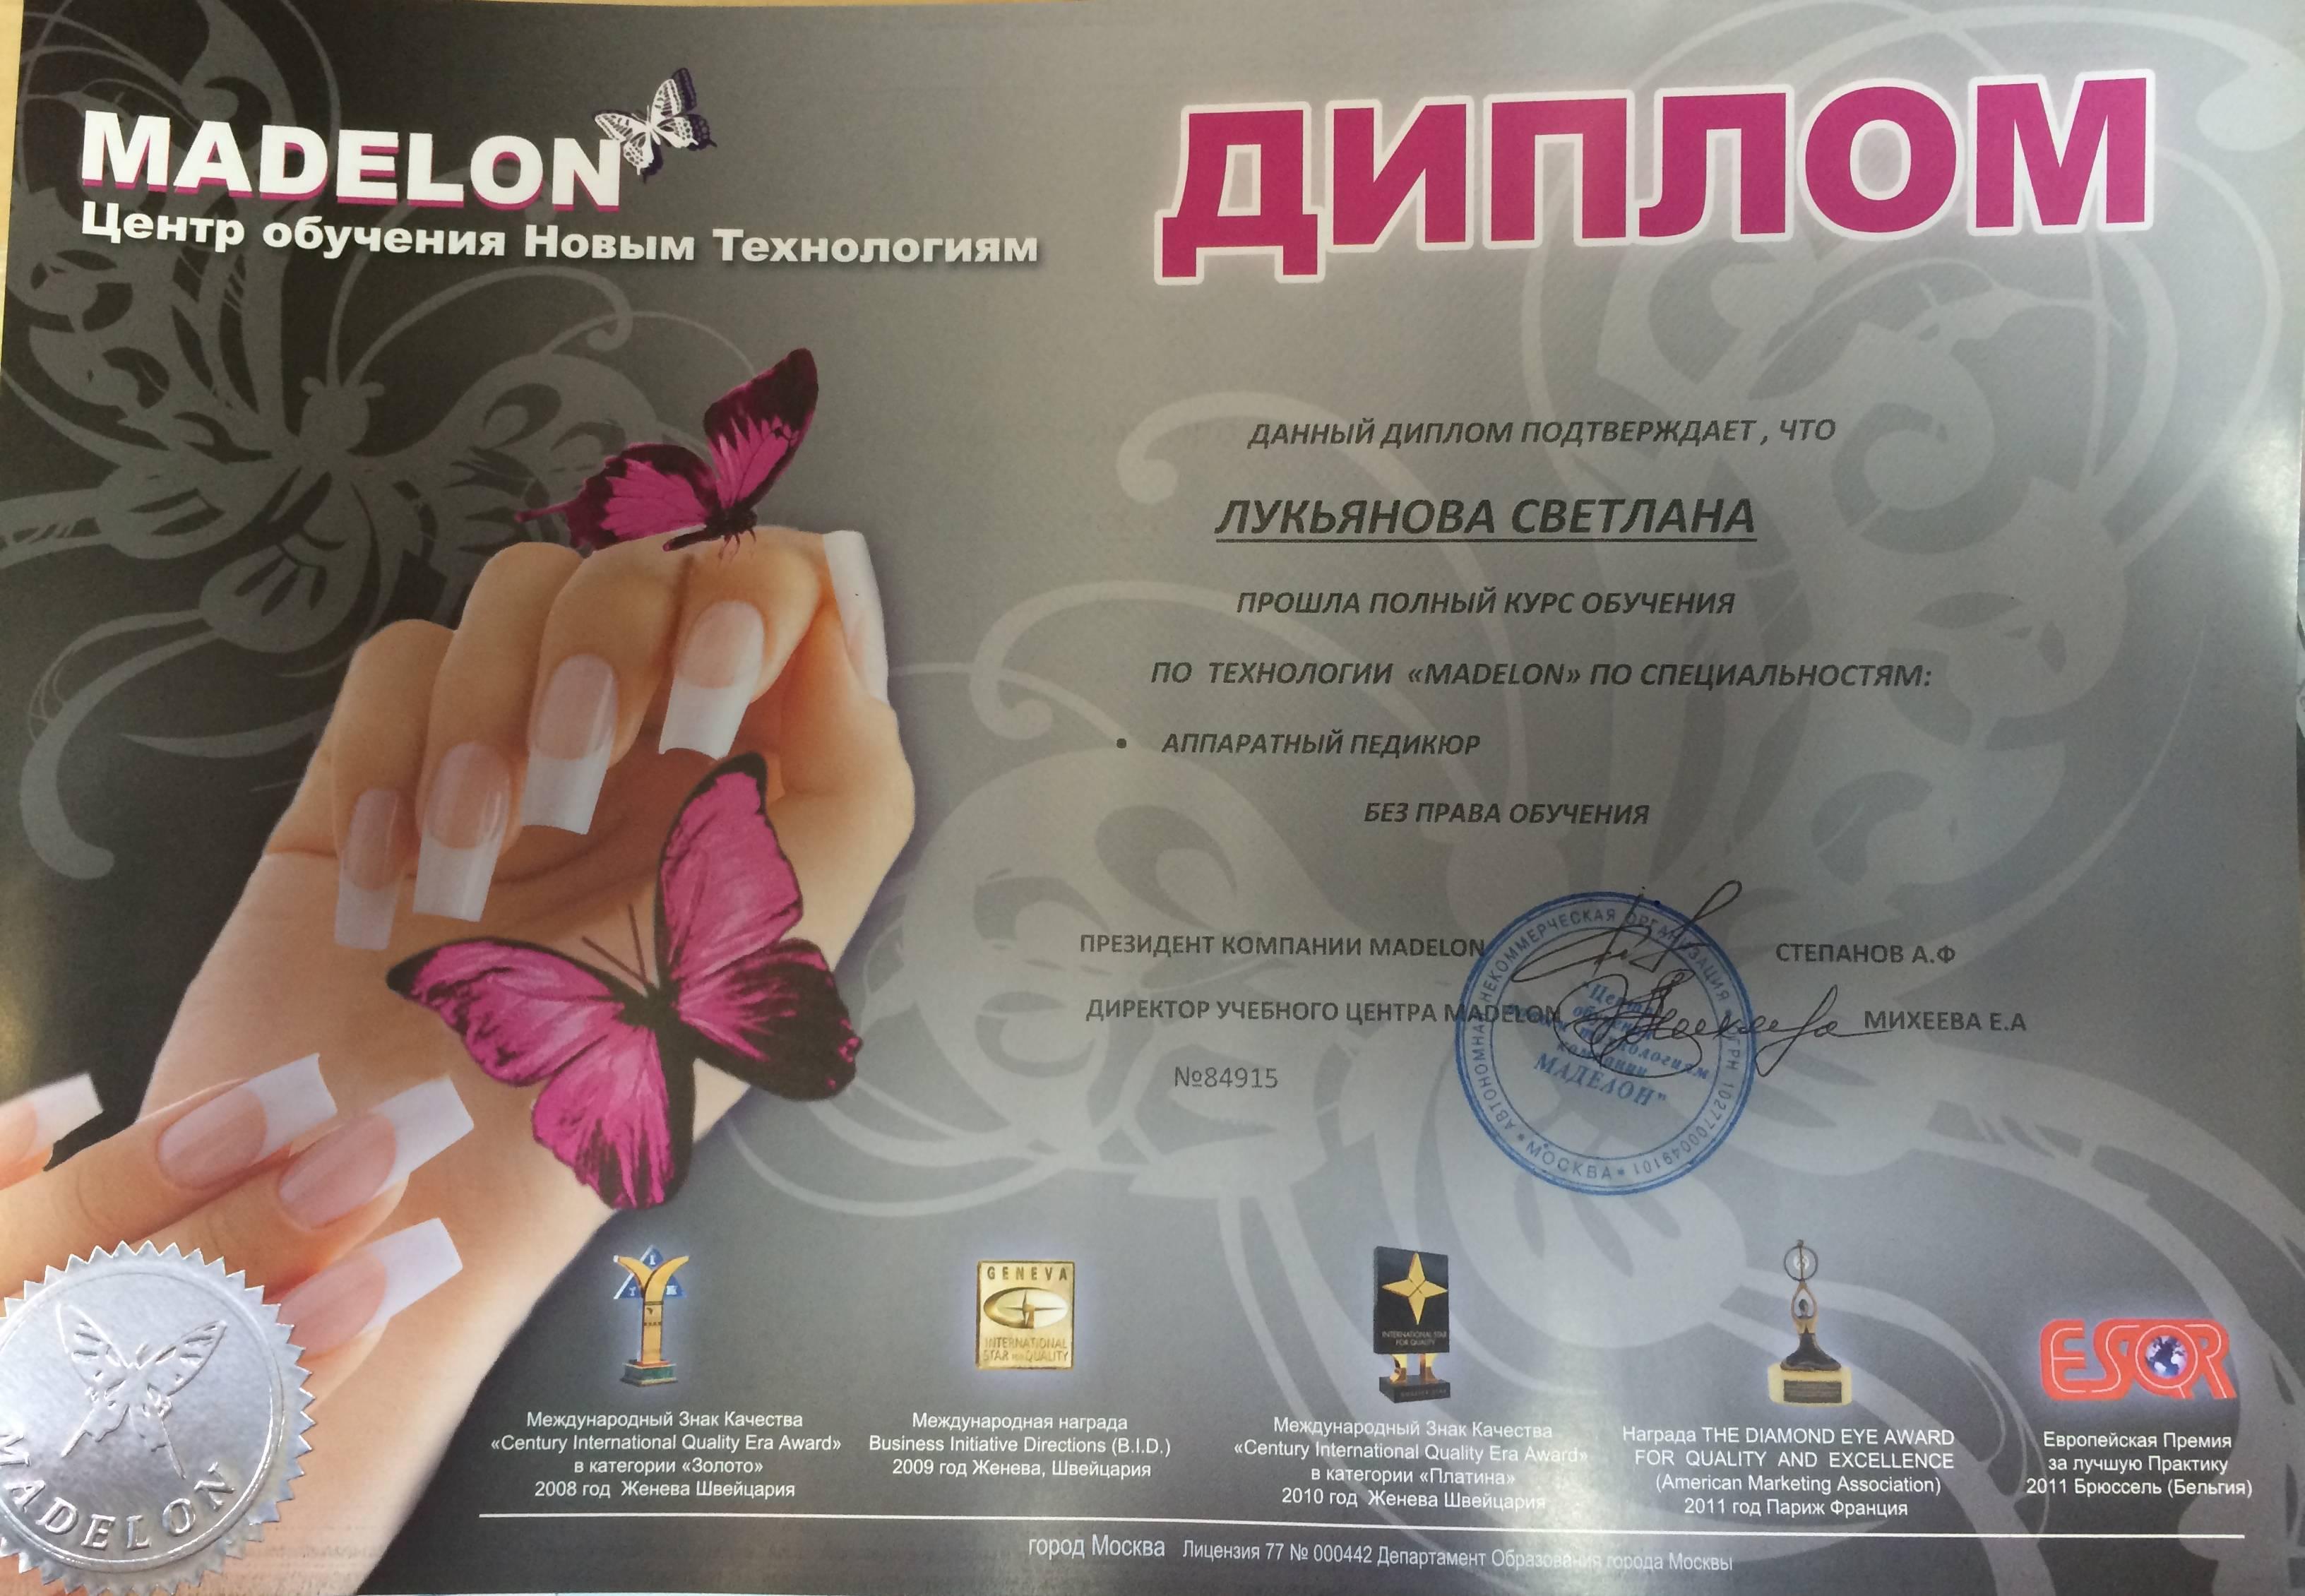 apparatniy_pedikyur_sahnevich